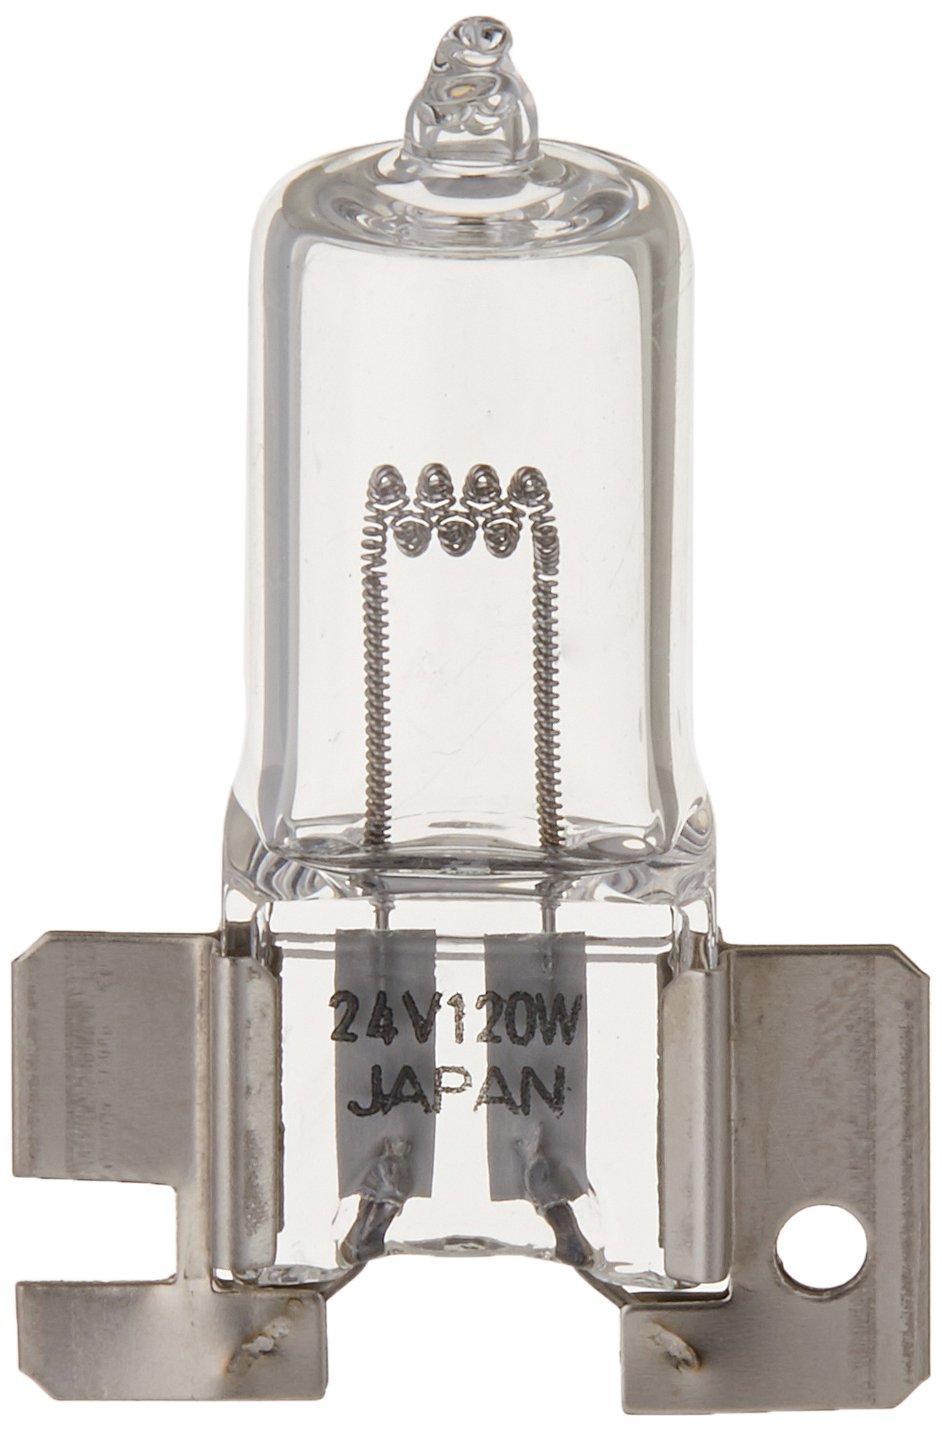 Ushio BC4757 8000230 - SM-74000 Healthcare Medical Scientific Light Bulb